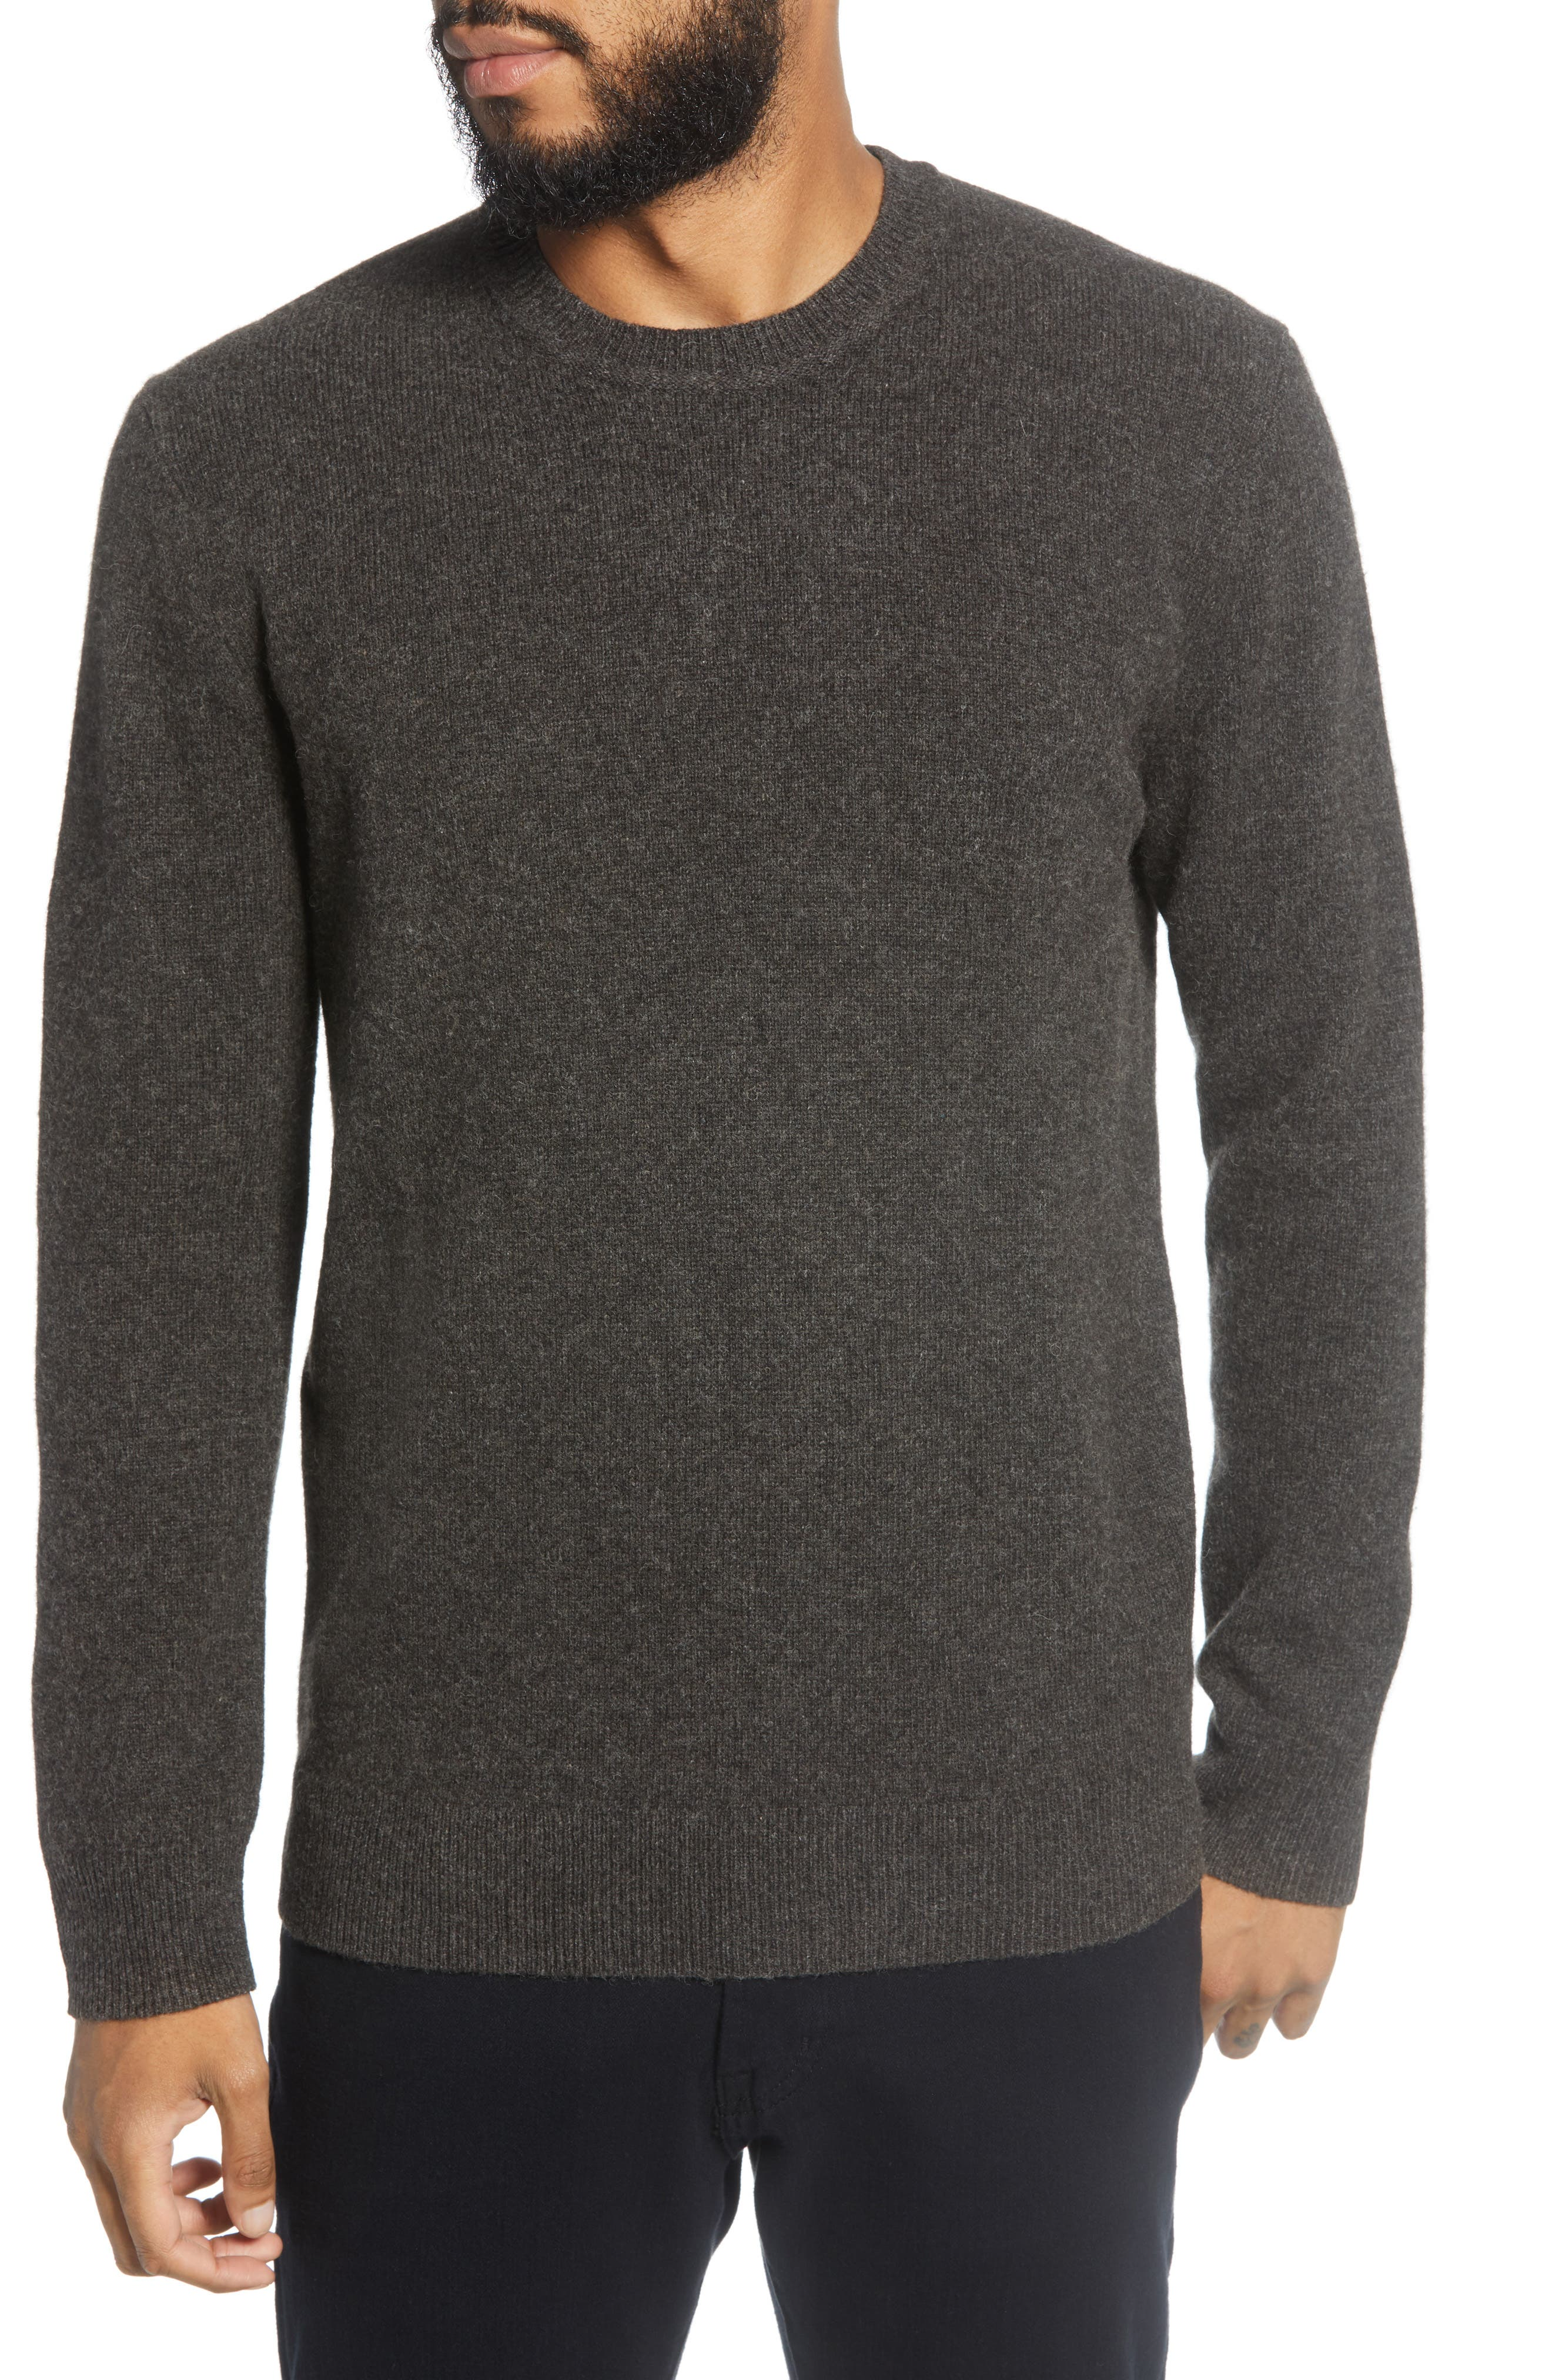 Image of BALDWIN Dean Crew Neck Wool Blend Sweater